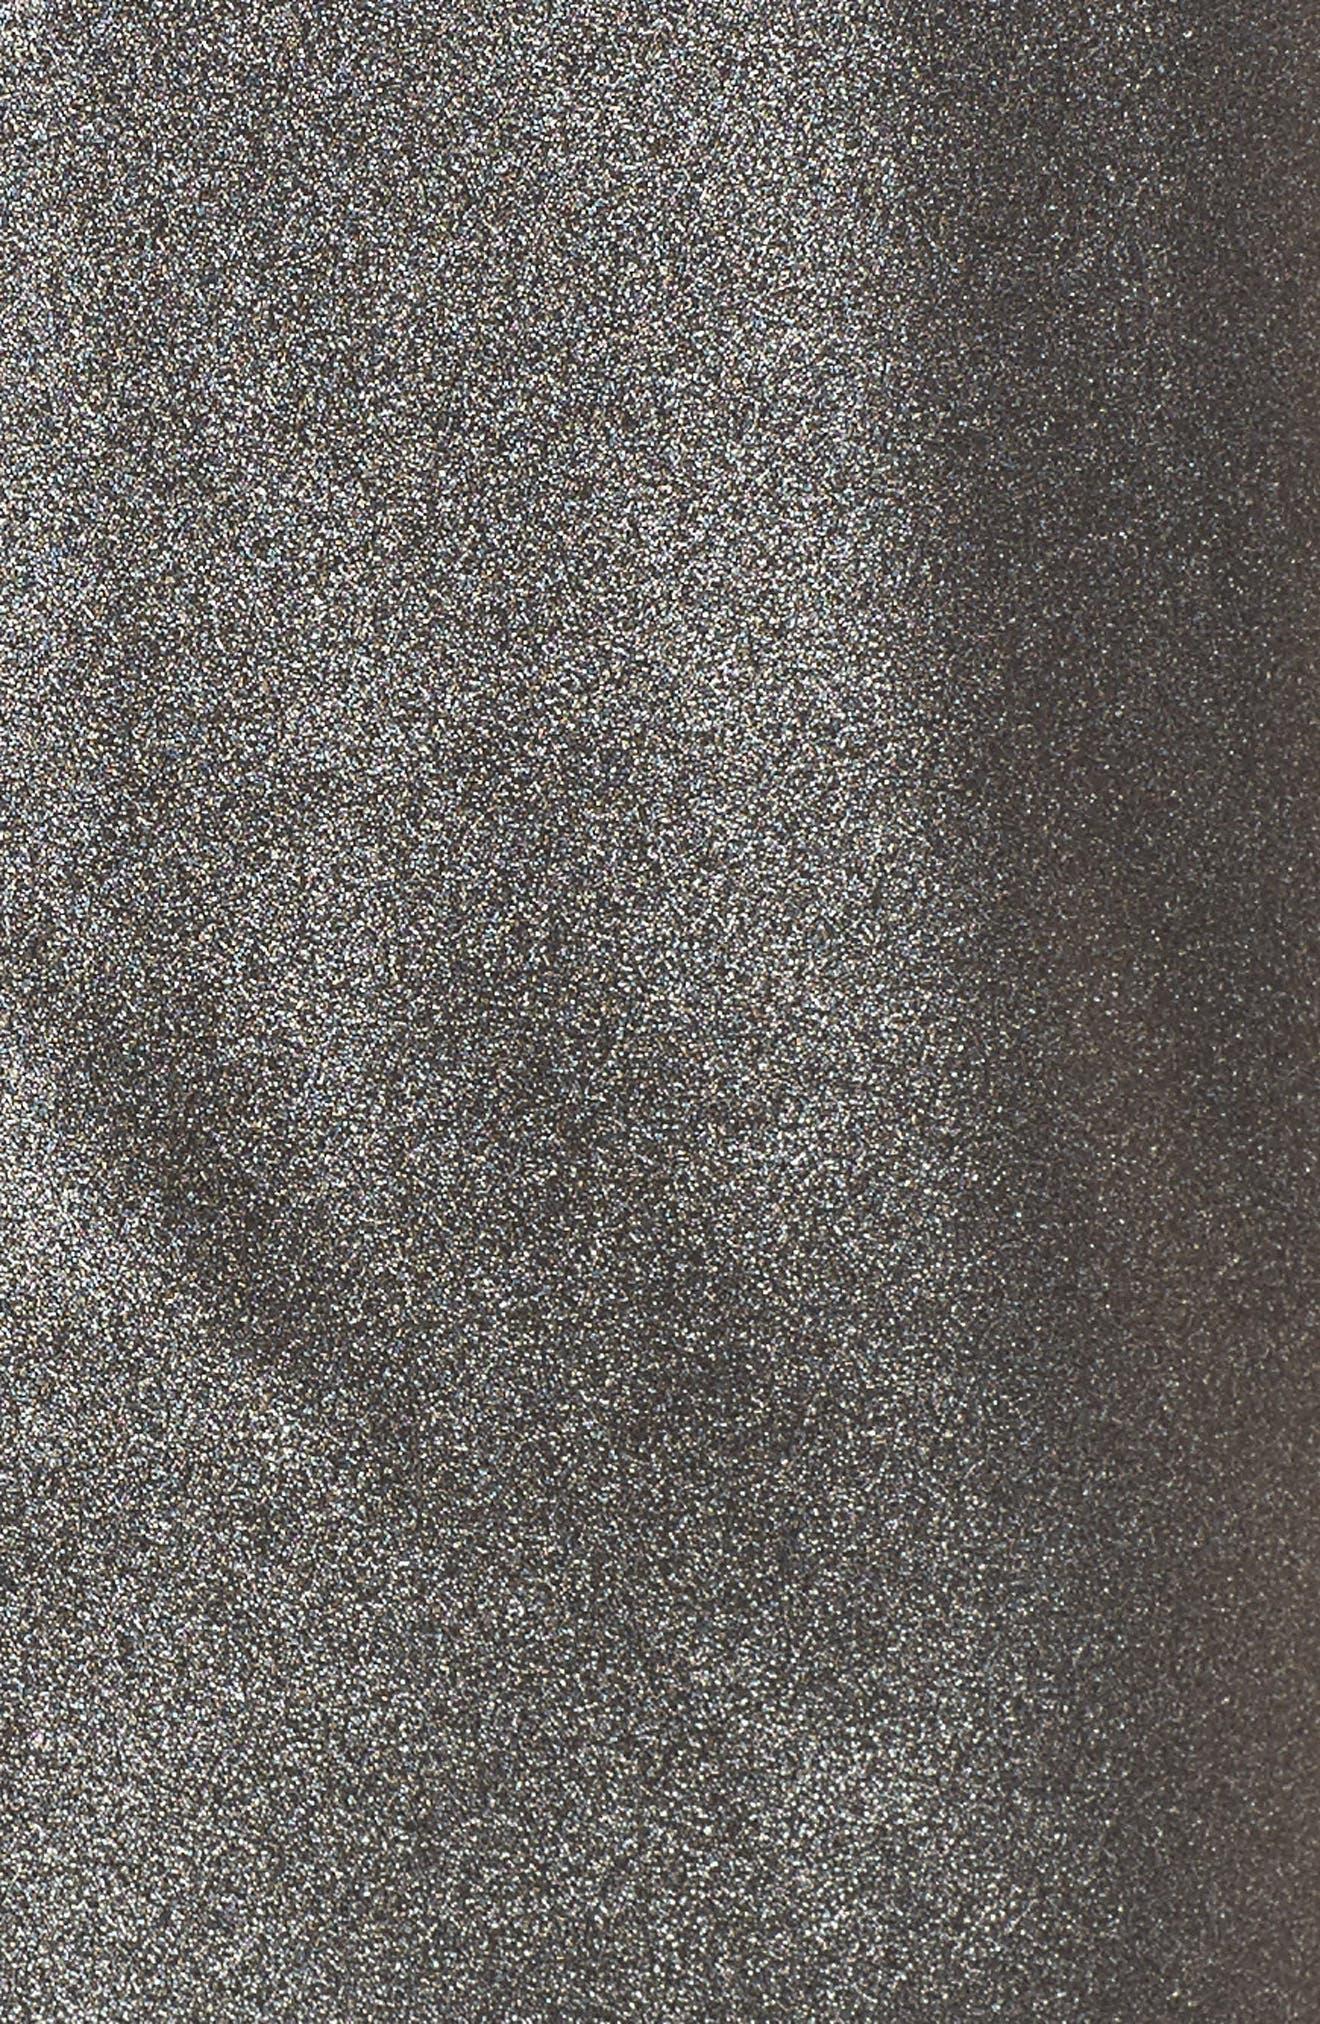 Choker Collar V-Neck Tank,                             Alternate thumbnail 5, color,                             Silver Foil